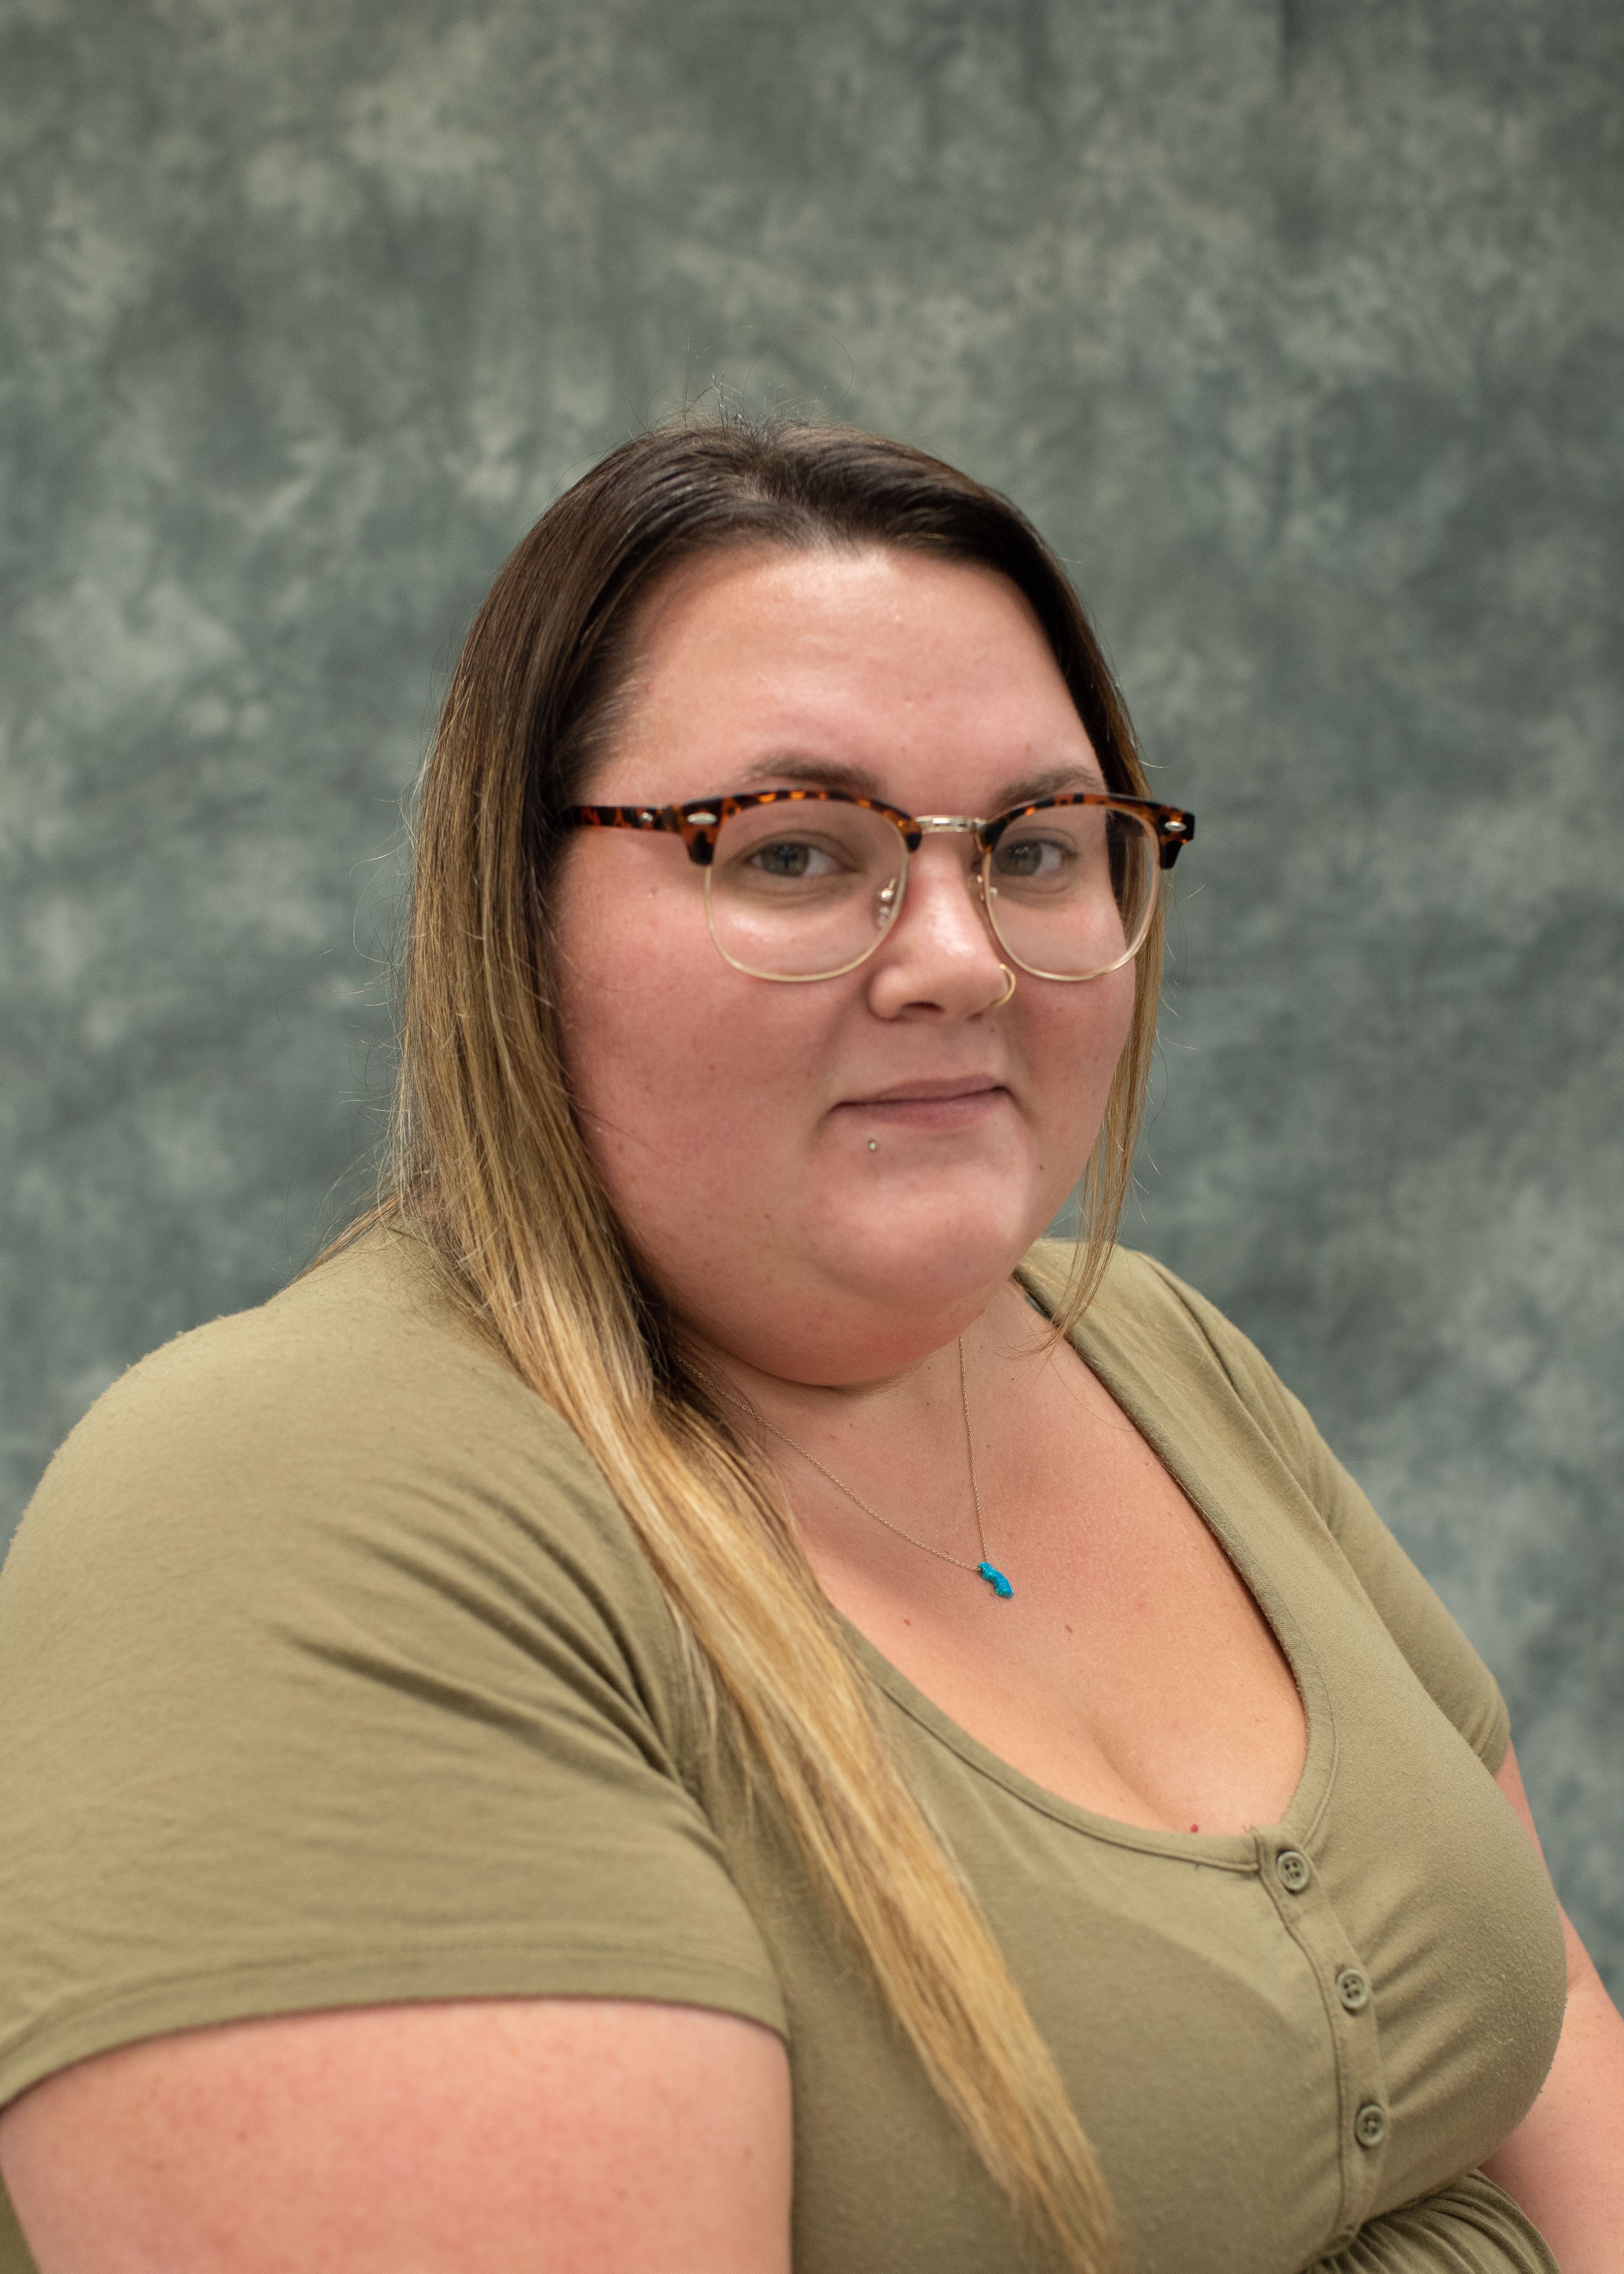 A photo of Lauren Costanzo, Board Member.